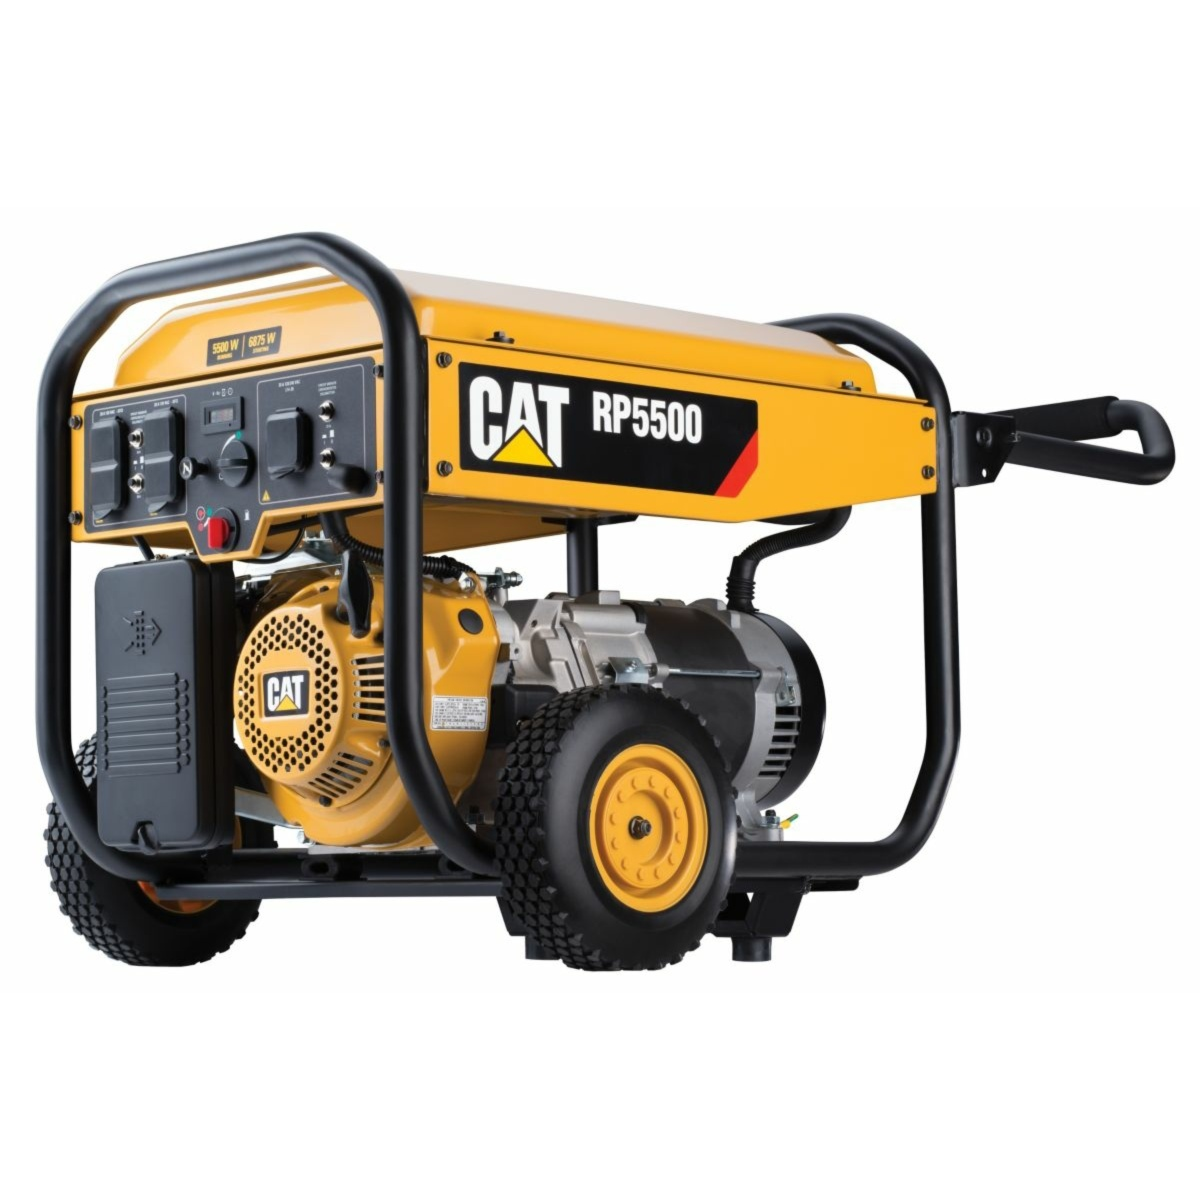 CAT RP5500 5500W Portable Generator